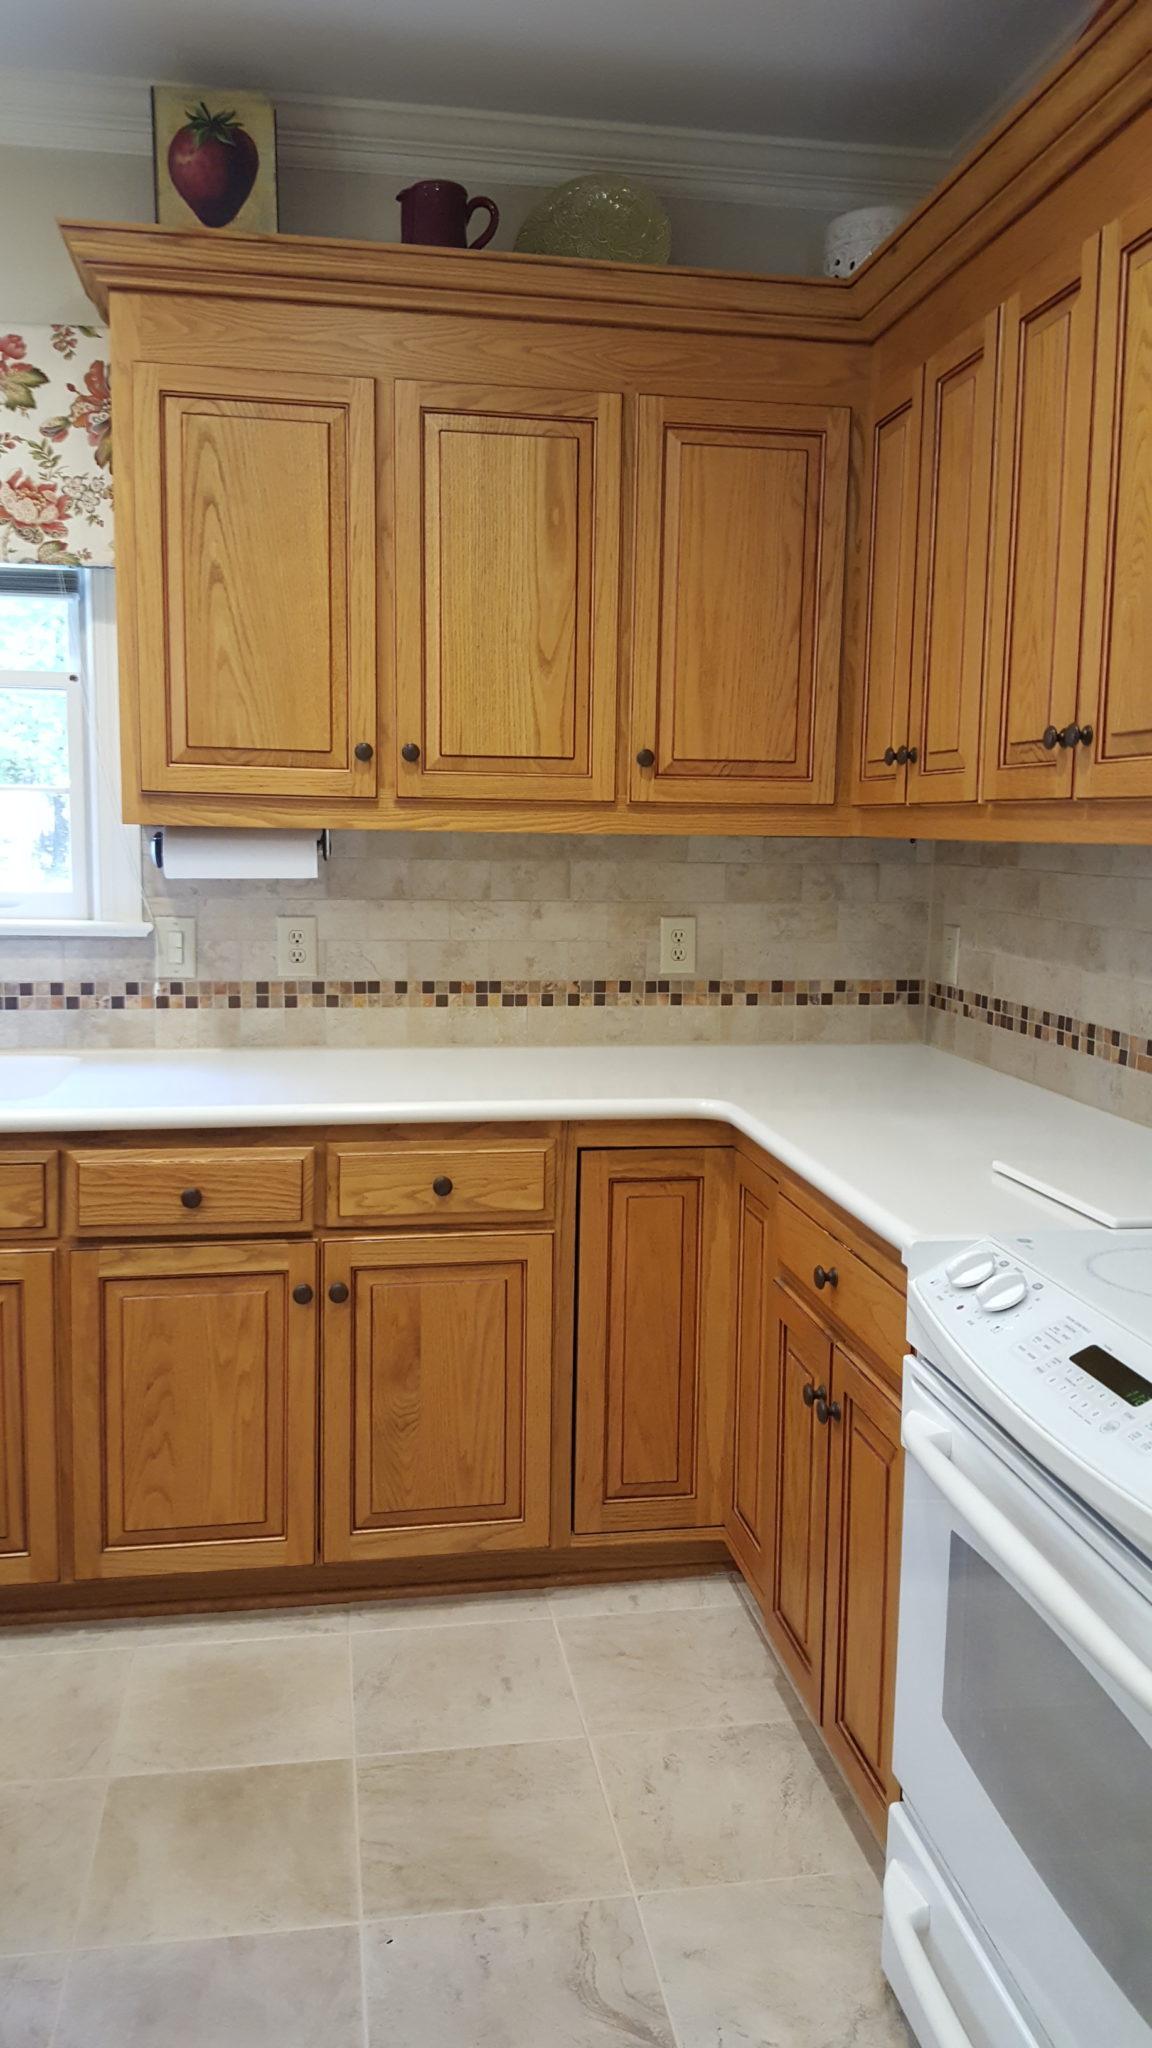 Color Match - Oak Kitchen & Laundry cabinets - 2 Cabinet Girls